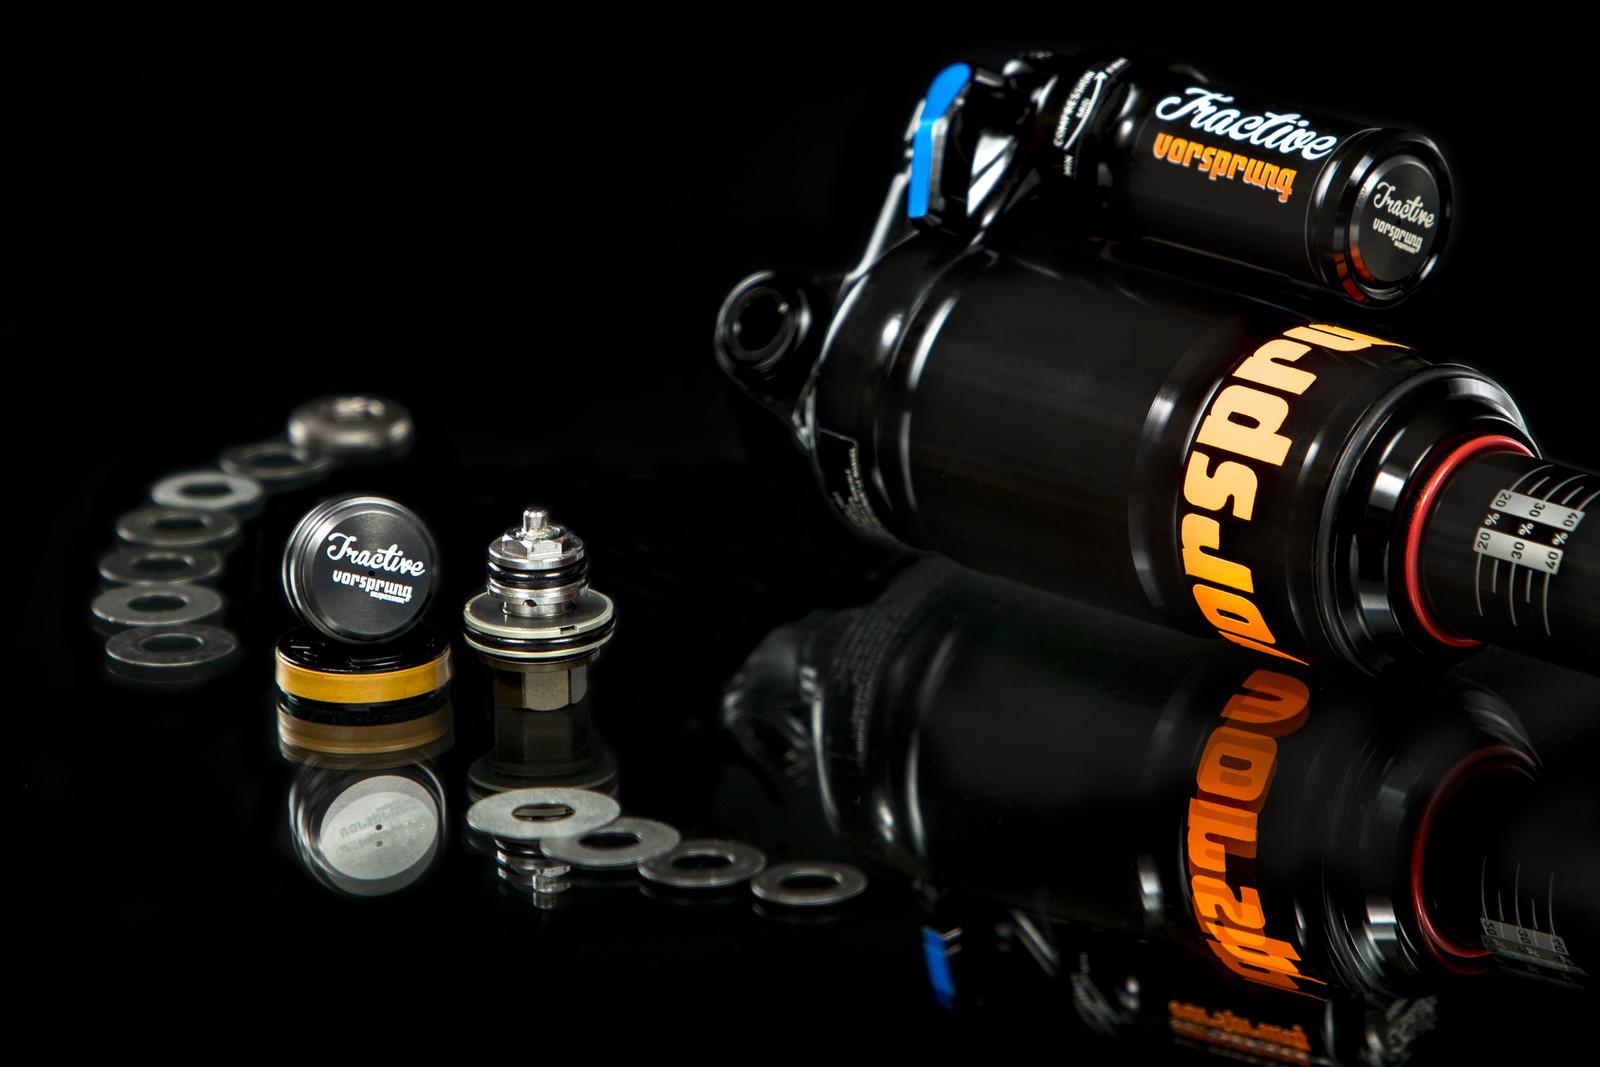 RockShox Monarch Plus shock Seal kit service damper /& air can upgraded improved